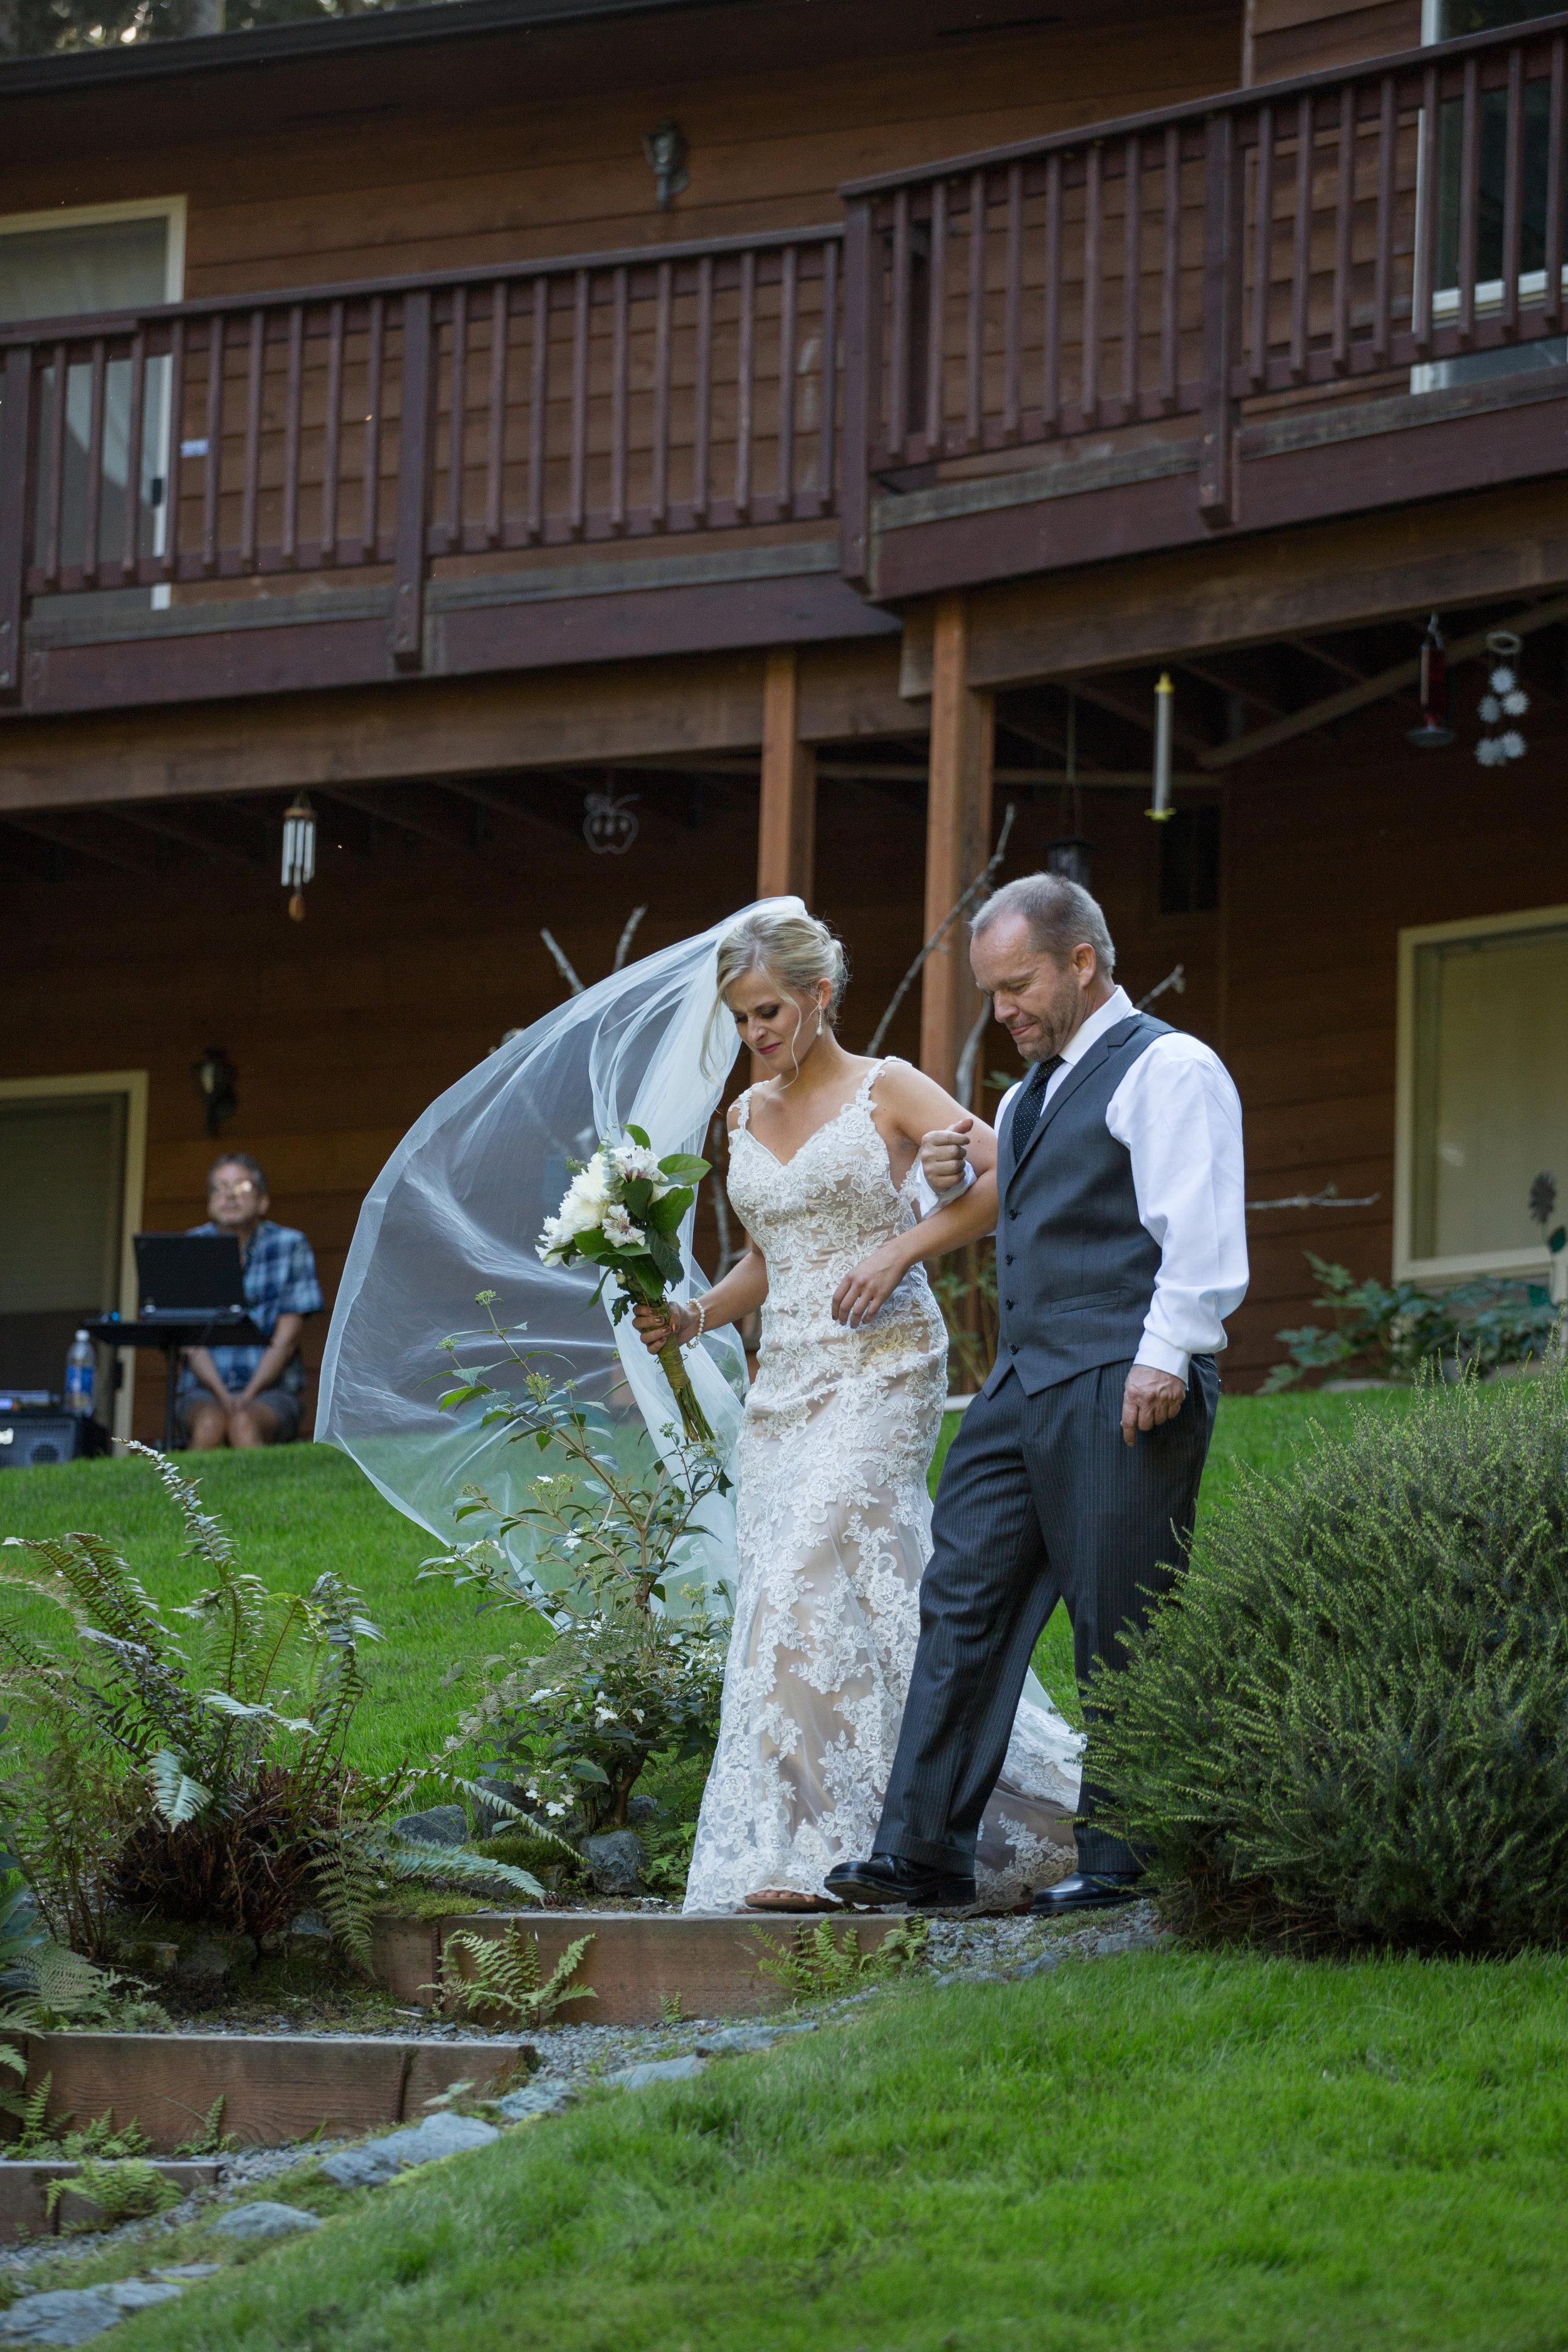 seattle wedding photography .jpg